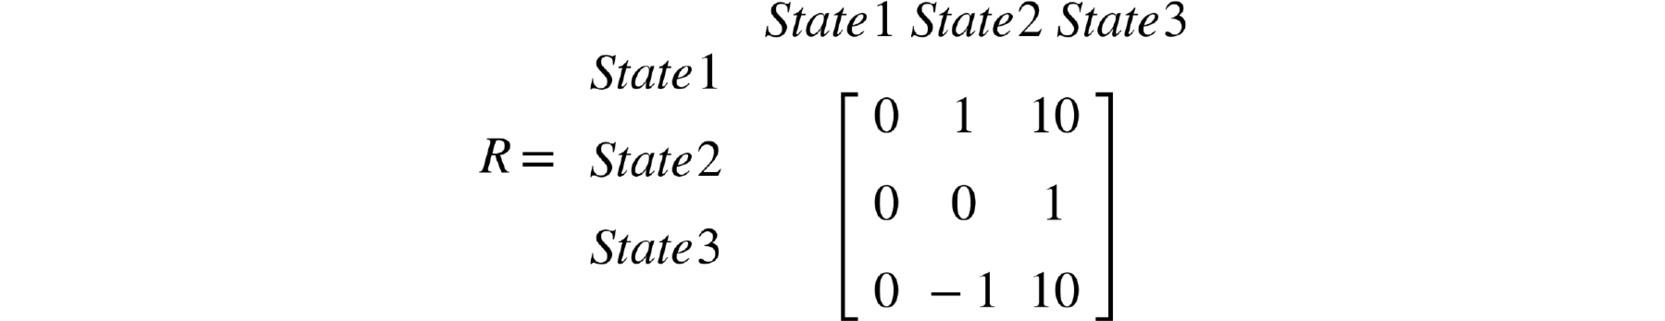 Figure 2.12: Reward matrix for the MRP example